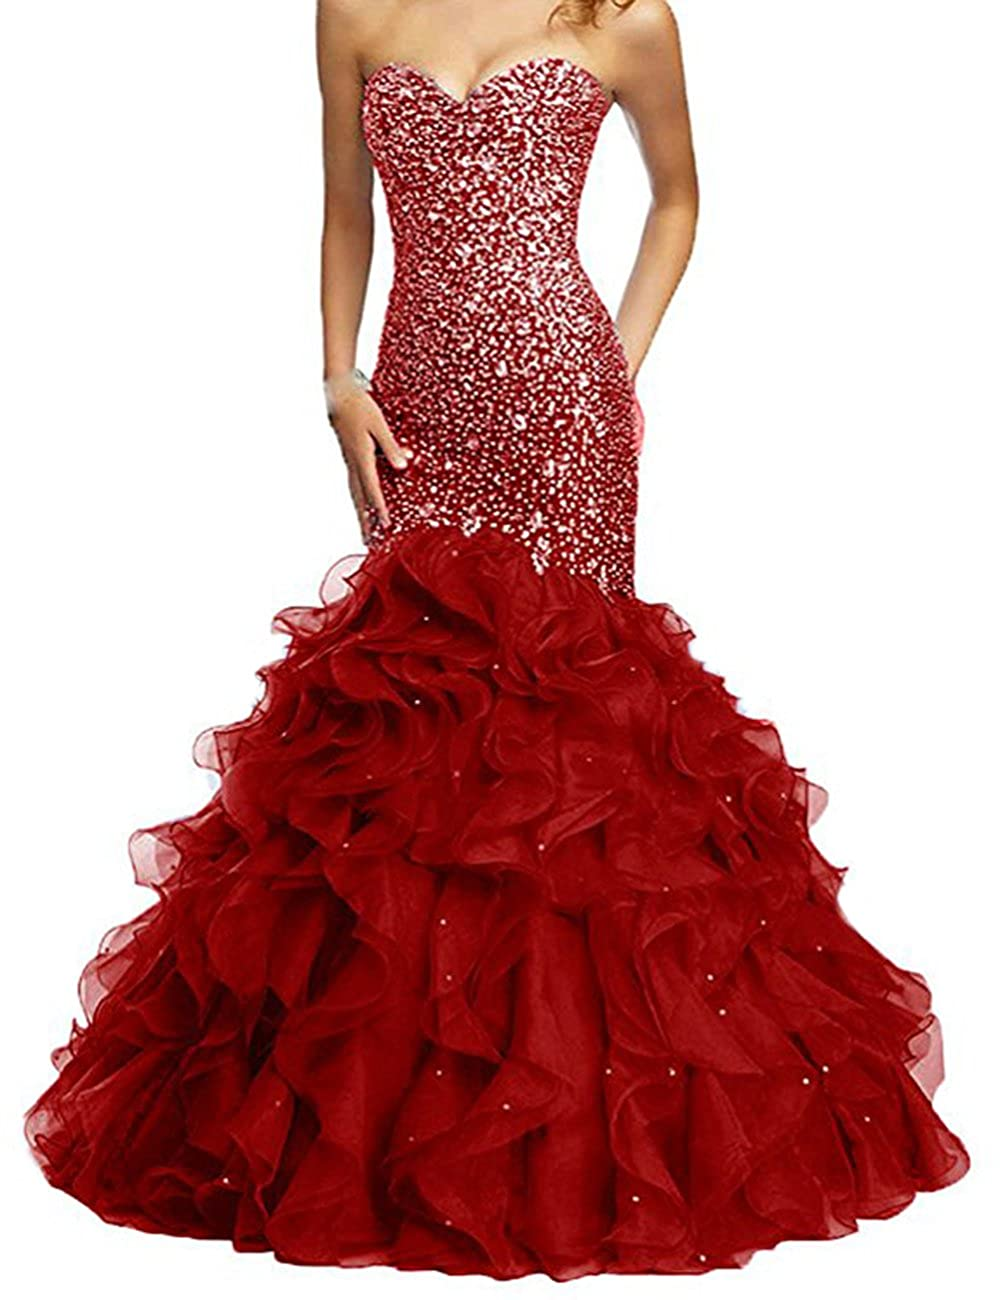 Dark Red Beautydress Luxury Beaded Lace Up Sweetheart Mermaid Prom Dresses for Women BP116